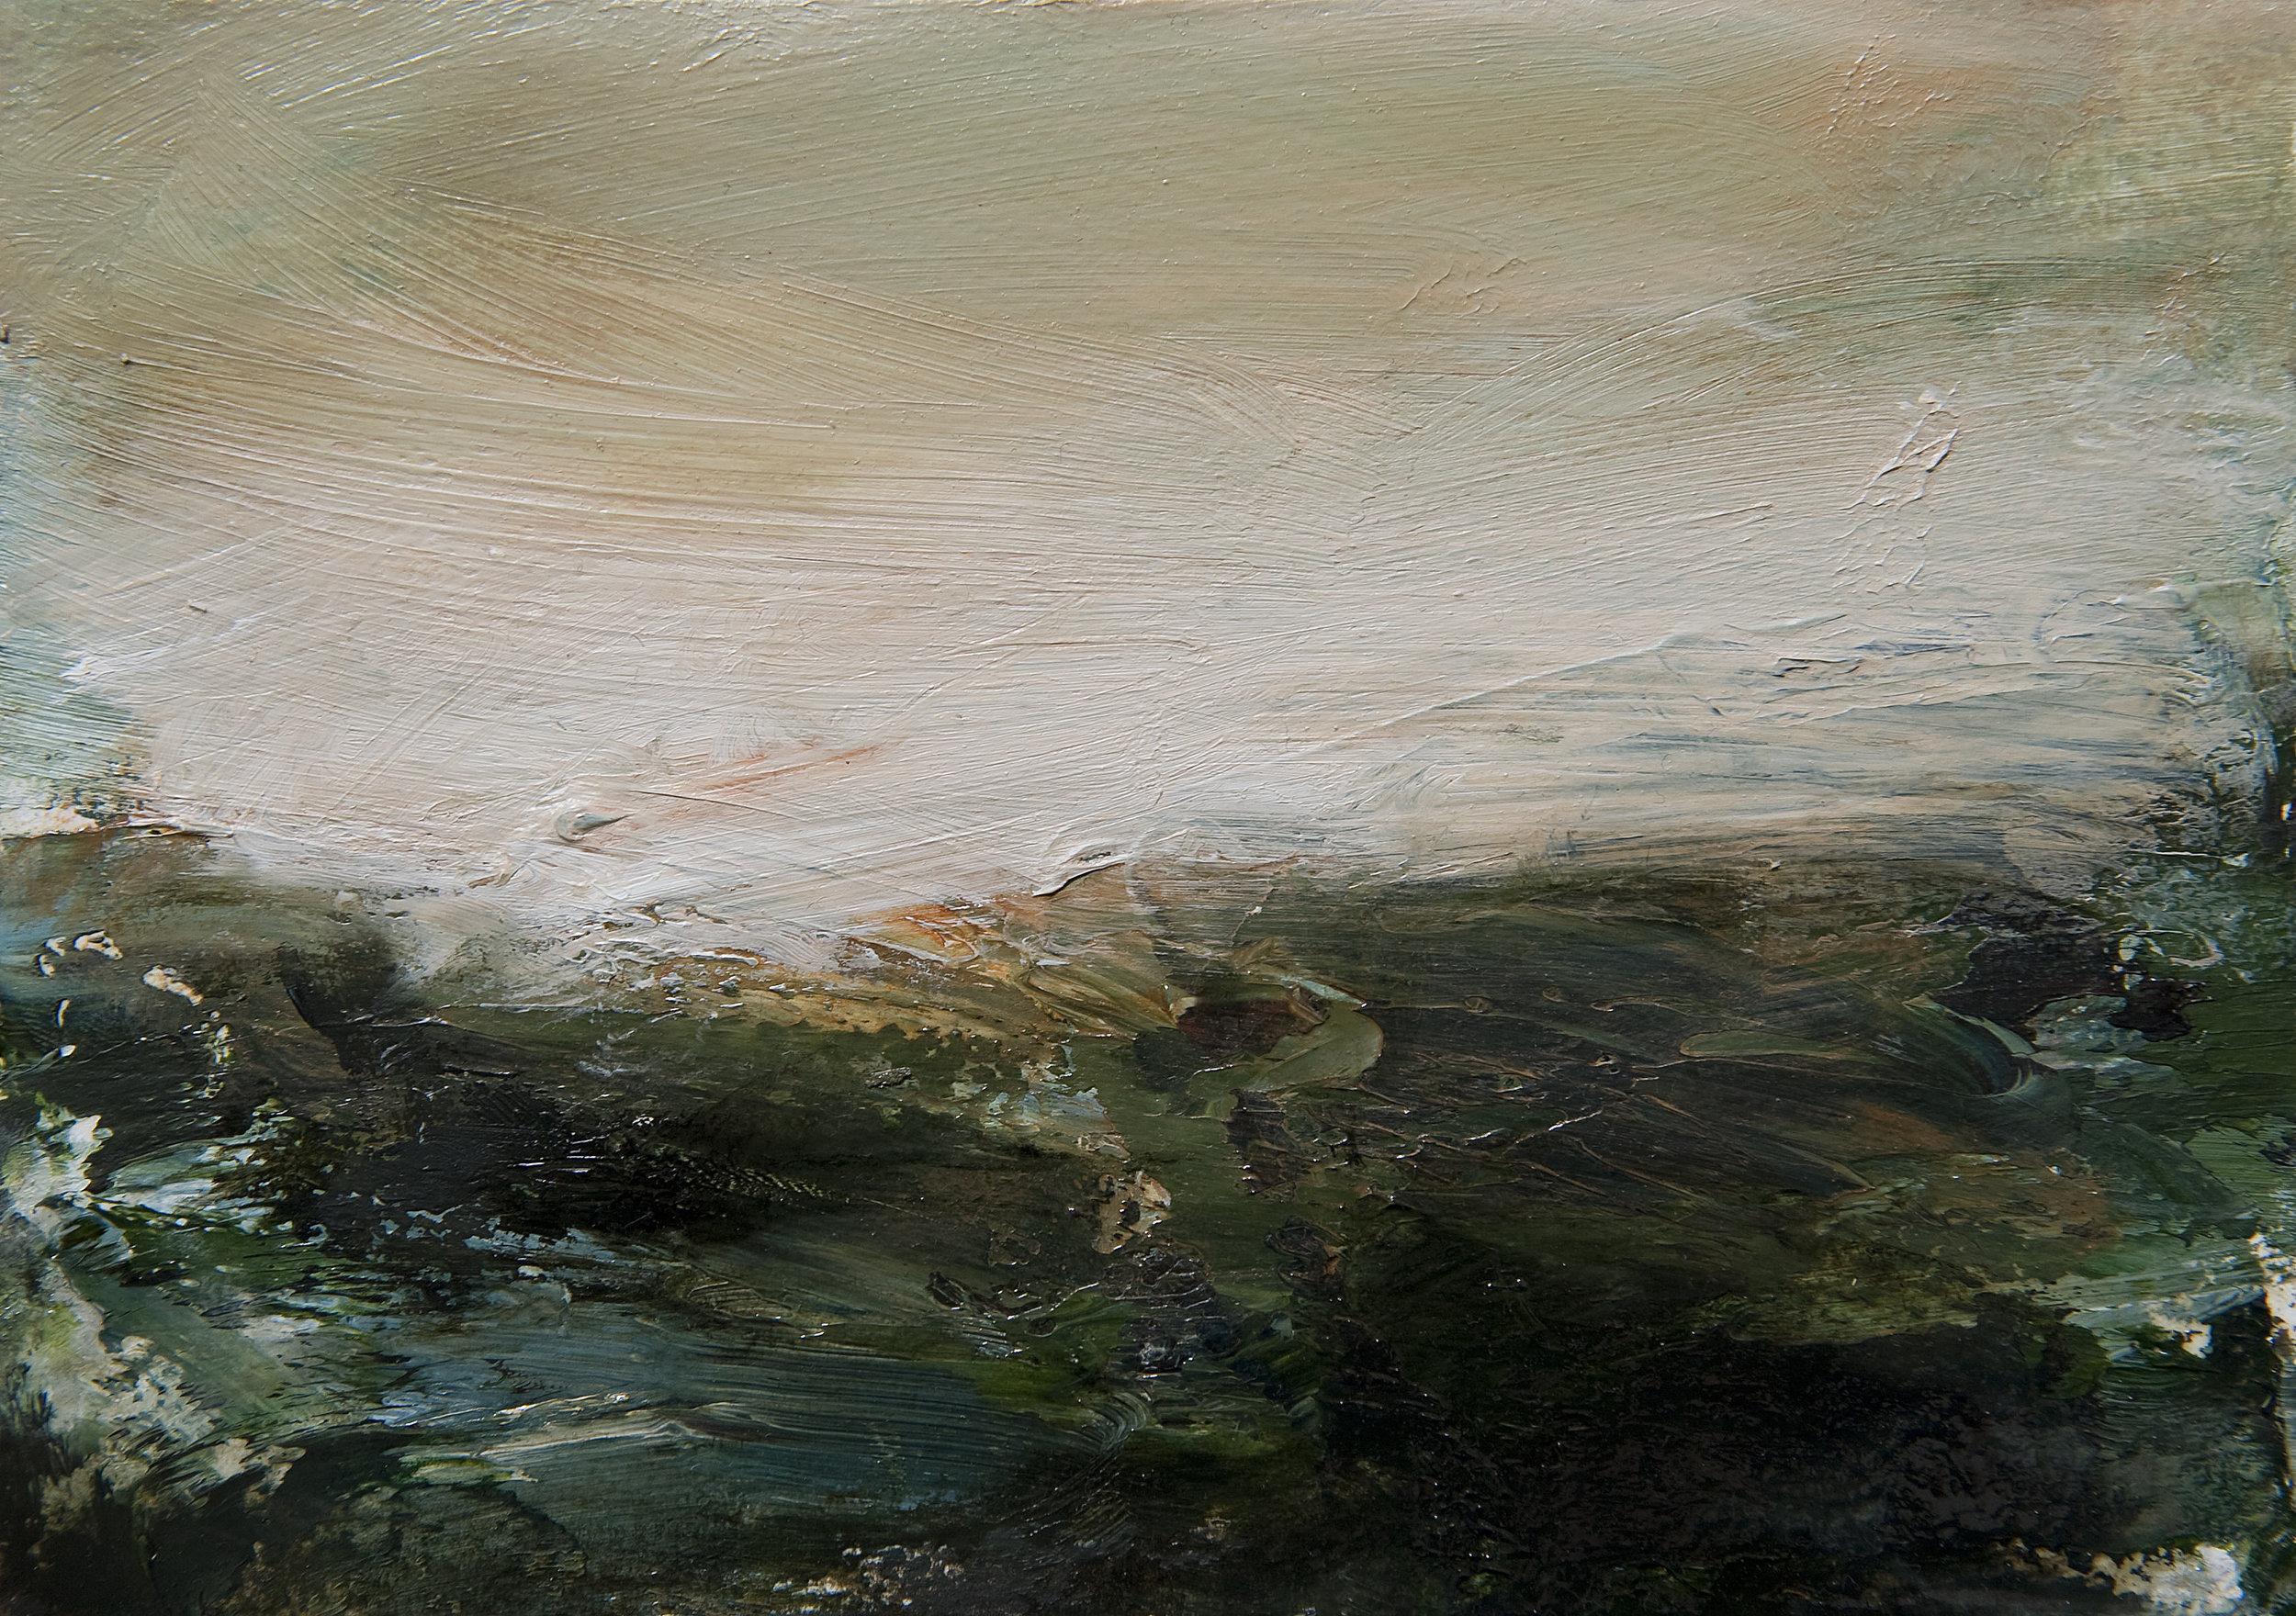 Lands oil on paper 15cm x 20cm 2013